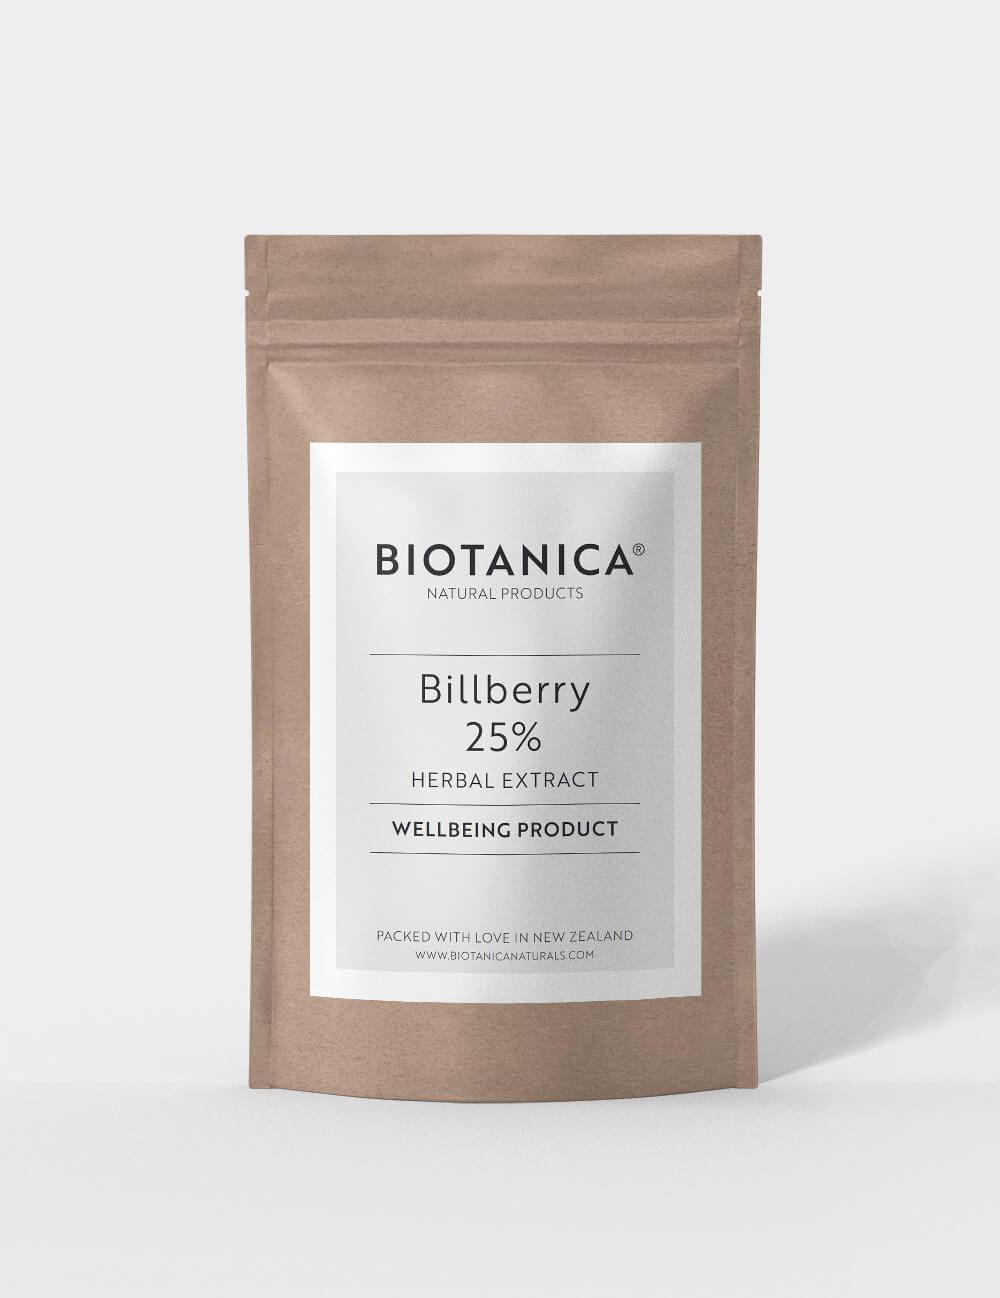 Billberry Image 1